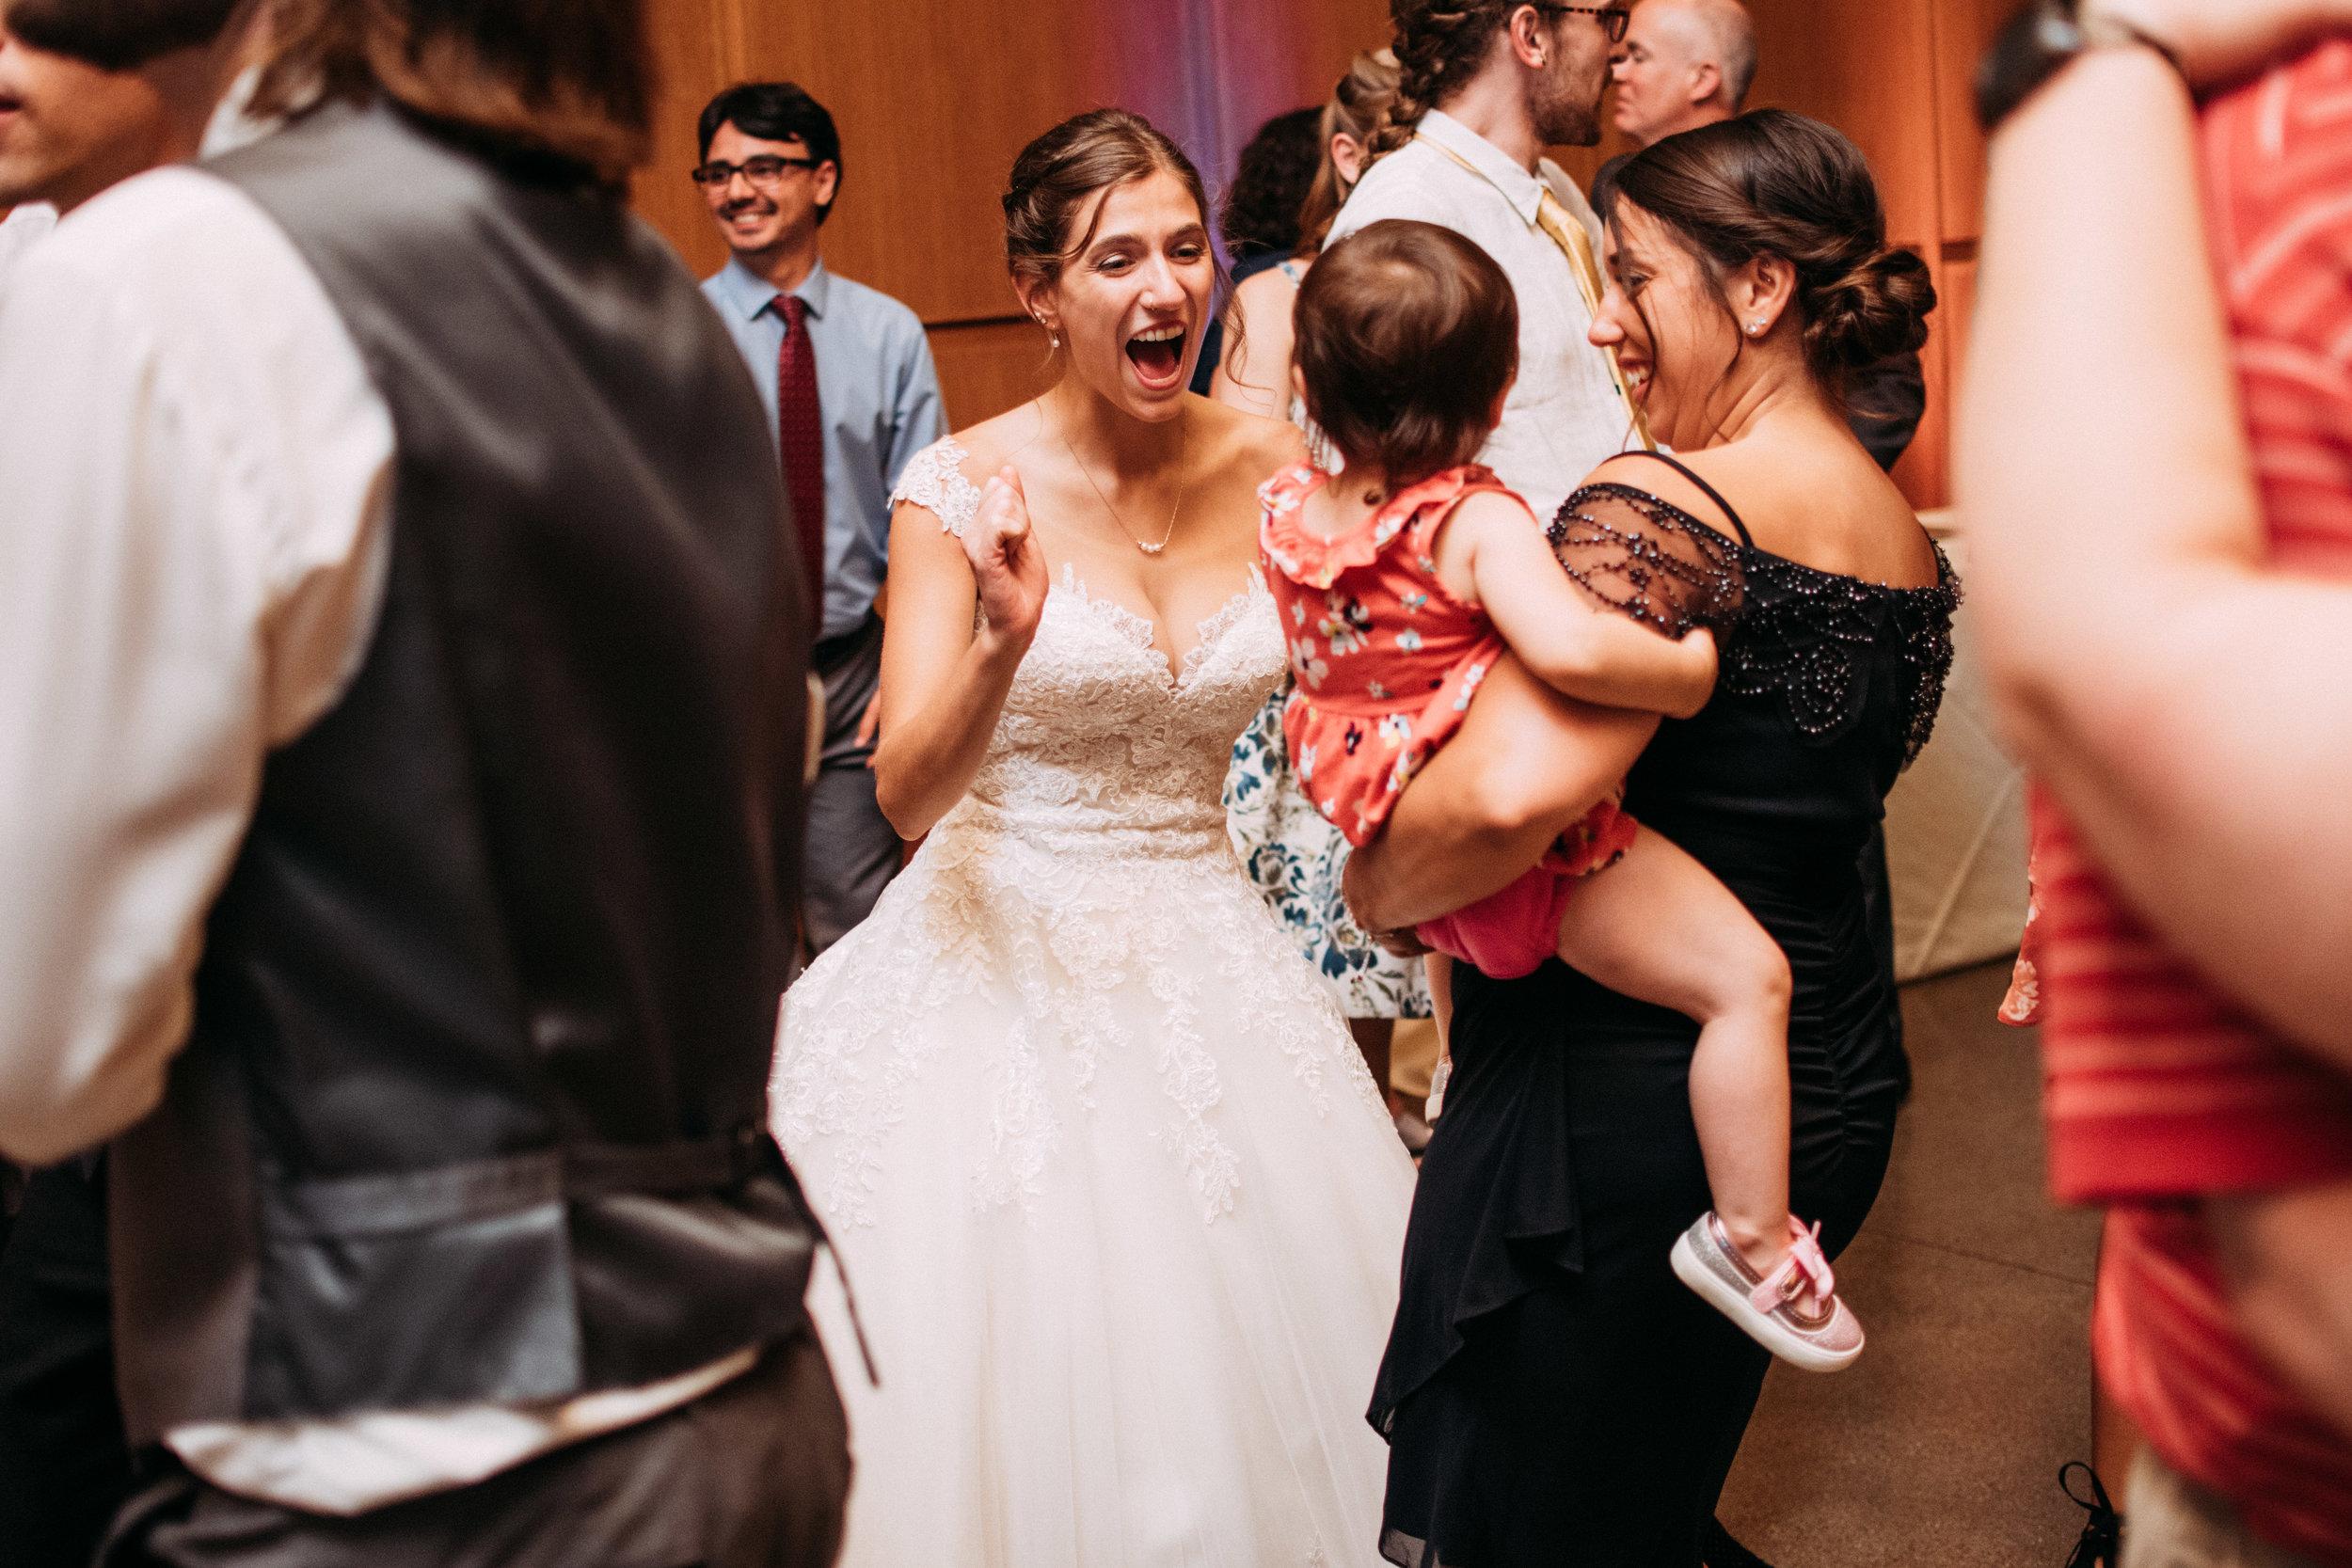 47-Liza_Chris_Minneapolis_Minnesota_Wedding.jpg